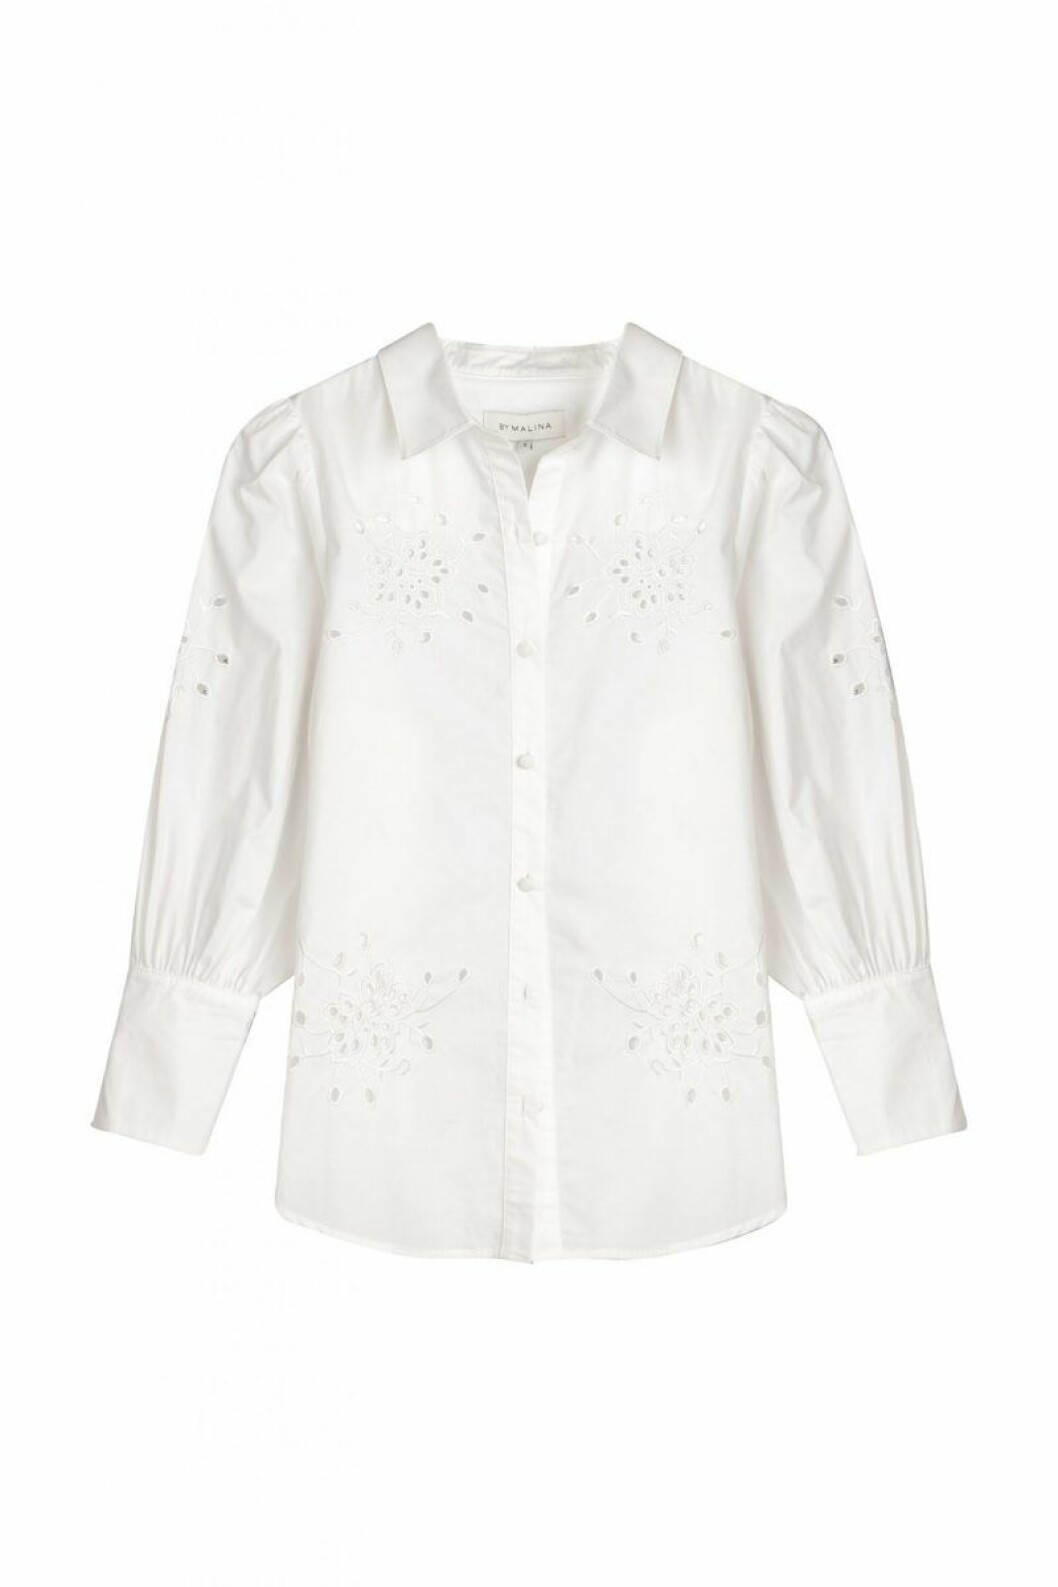 By Malina höstkollektion 2020: Vit skjorta